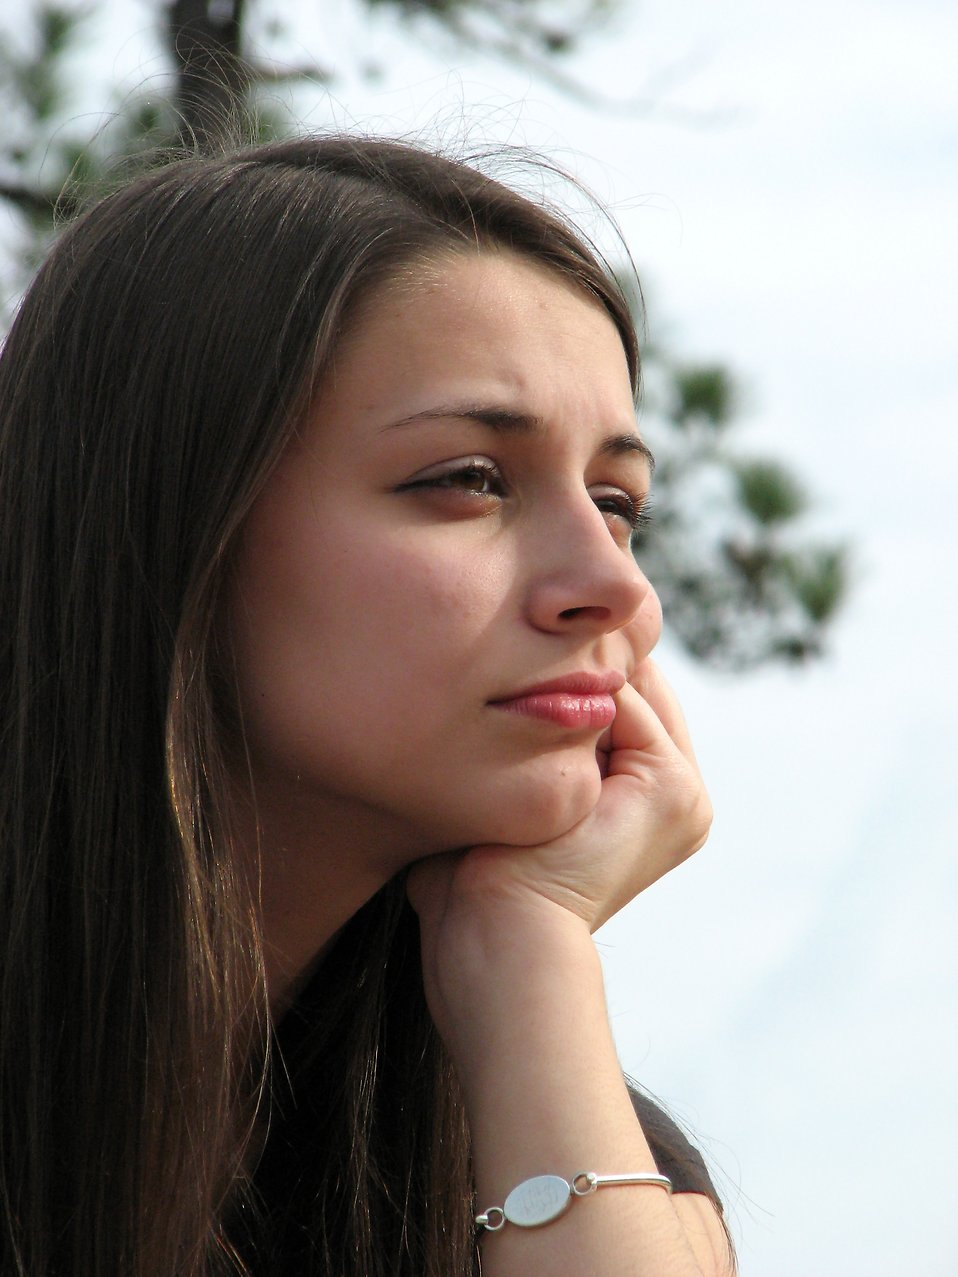 Closeup portrait of a teenage girl : Free Stock Photo